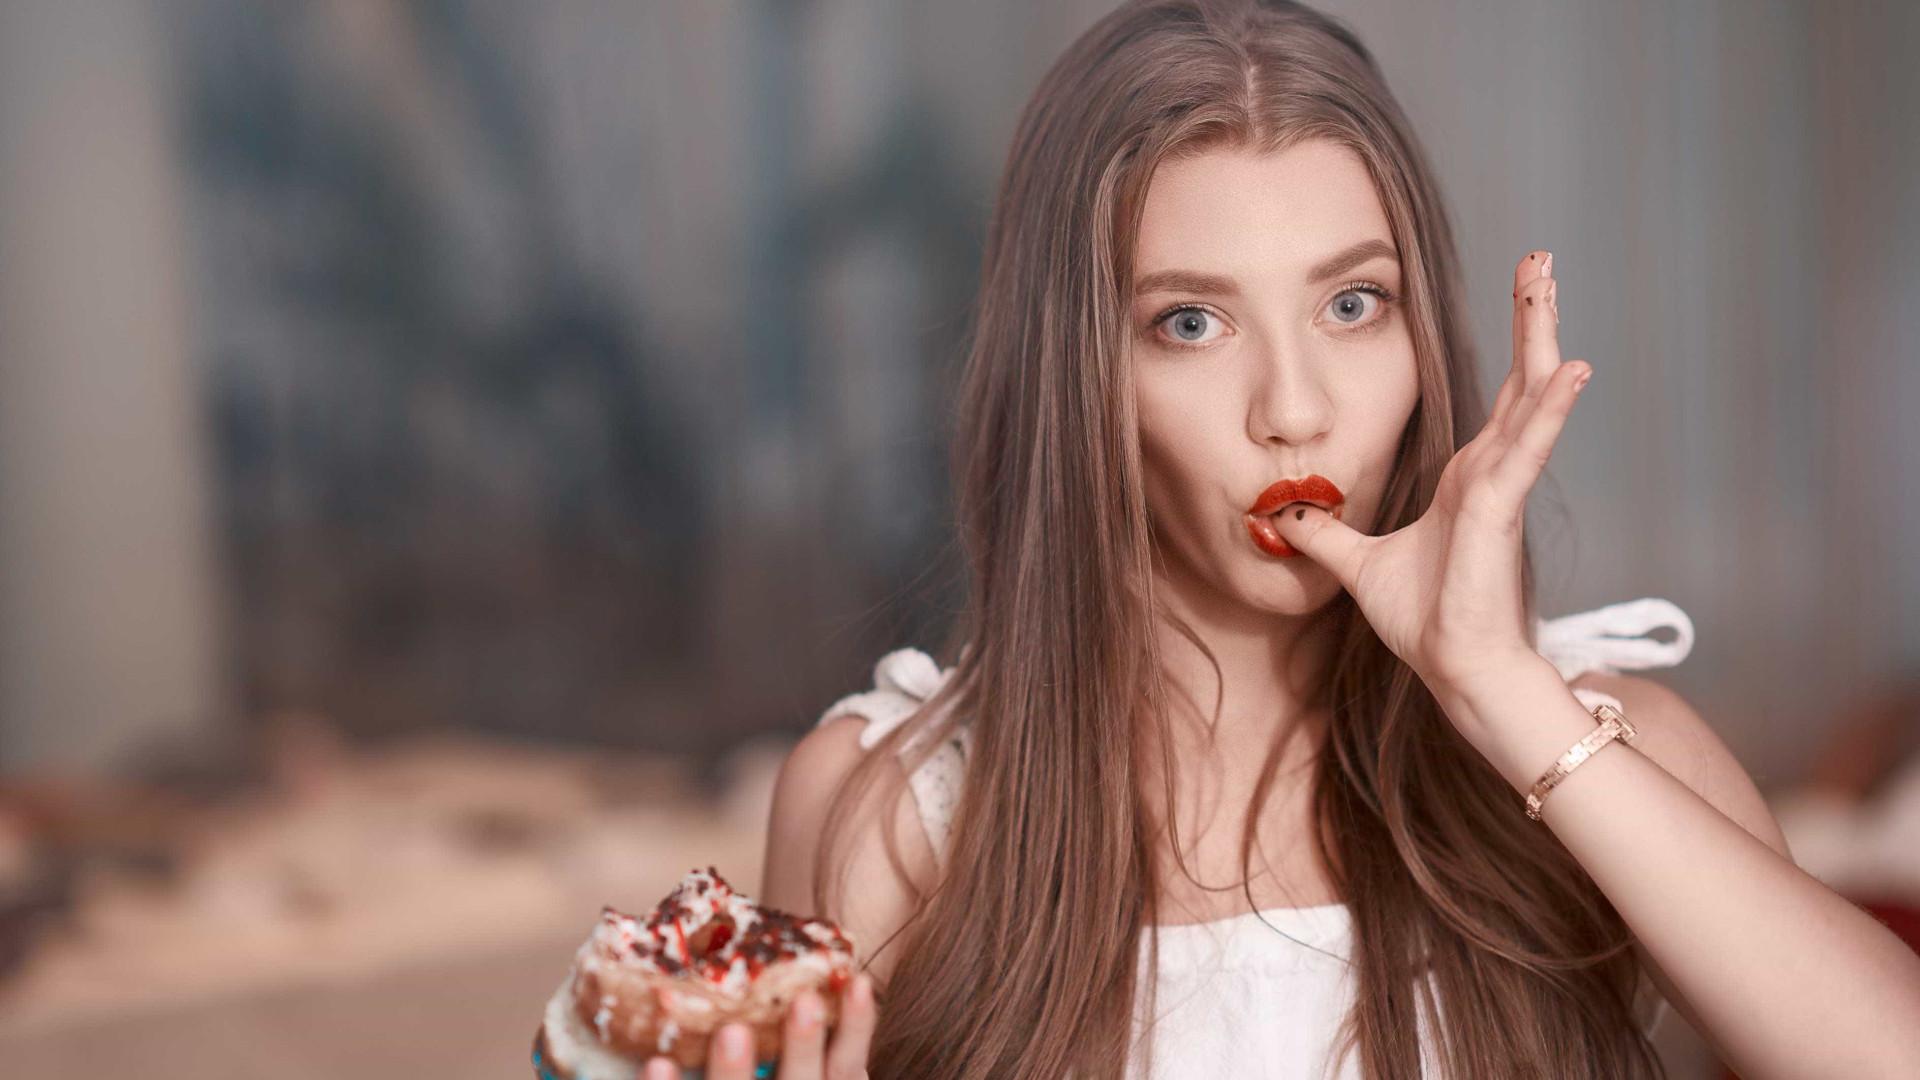 Sinais de que anda a comer demasiado açúcar